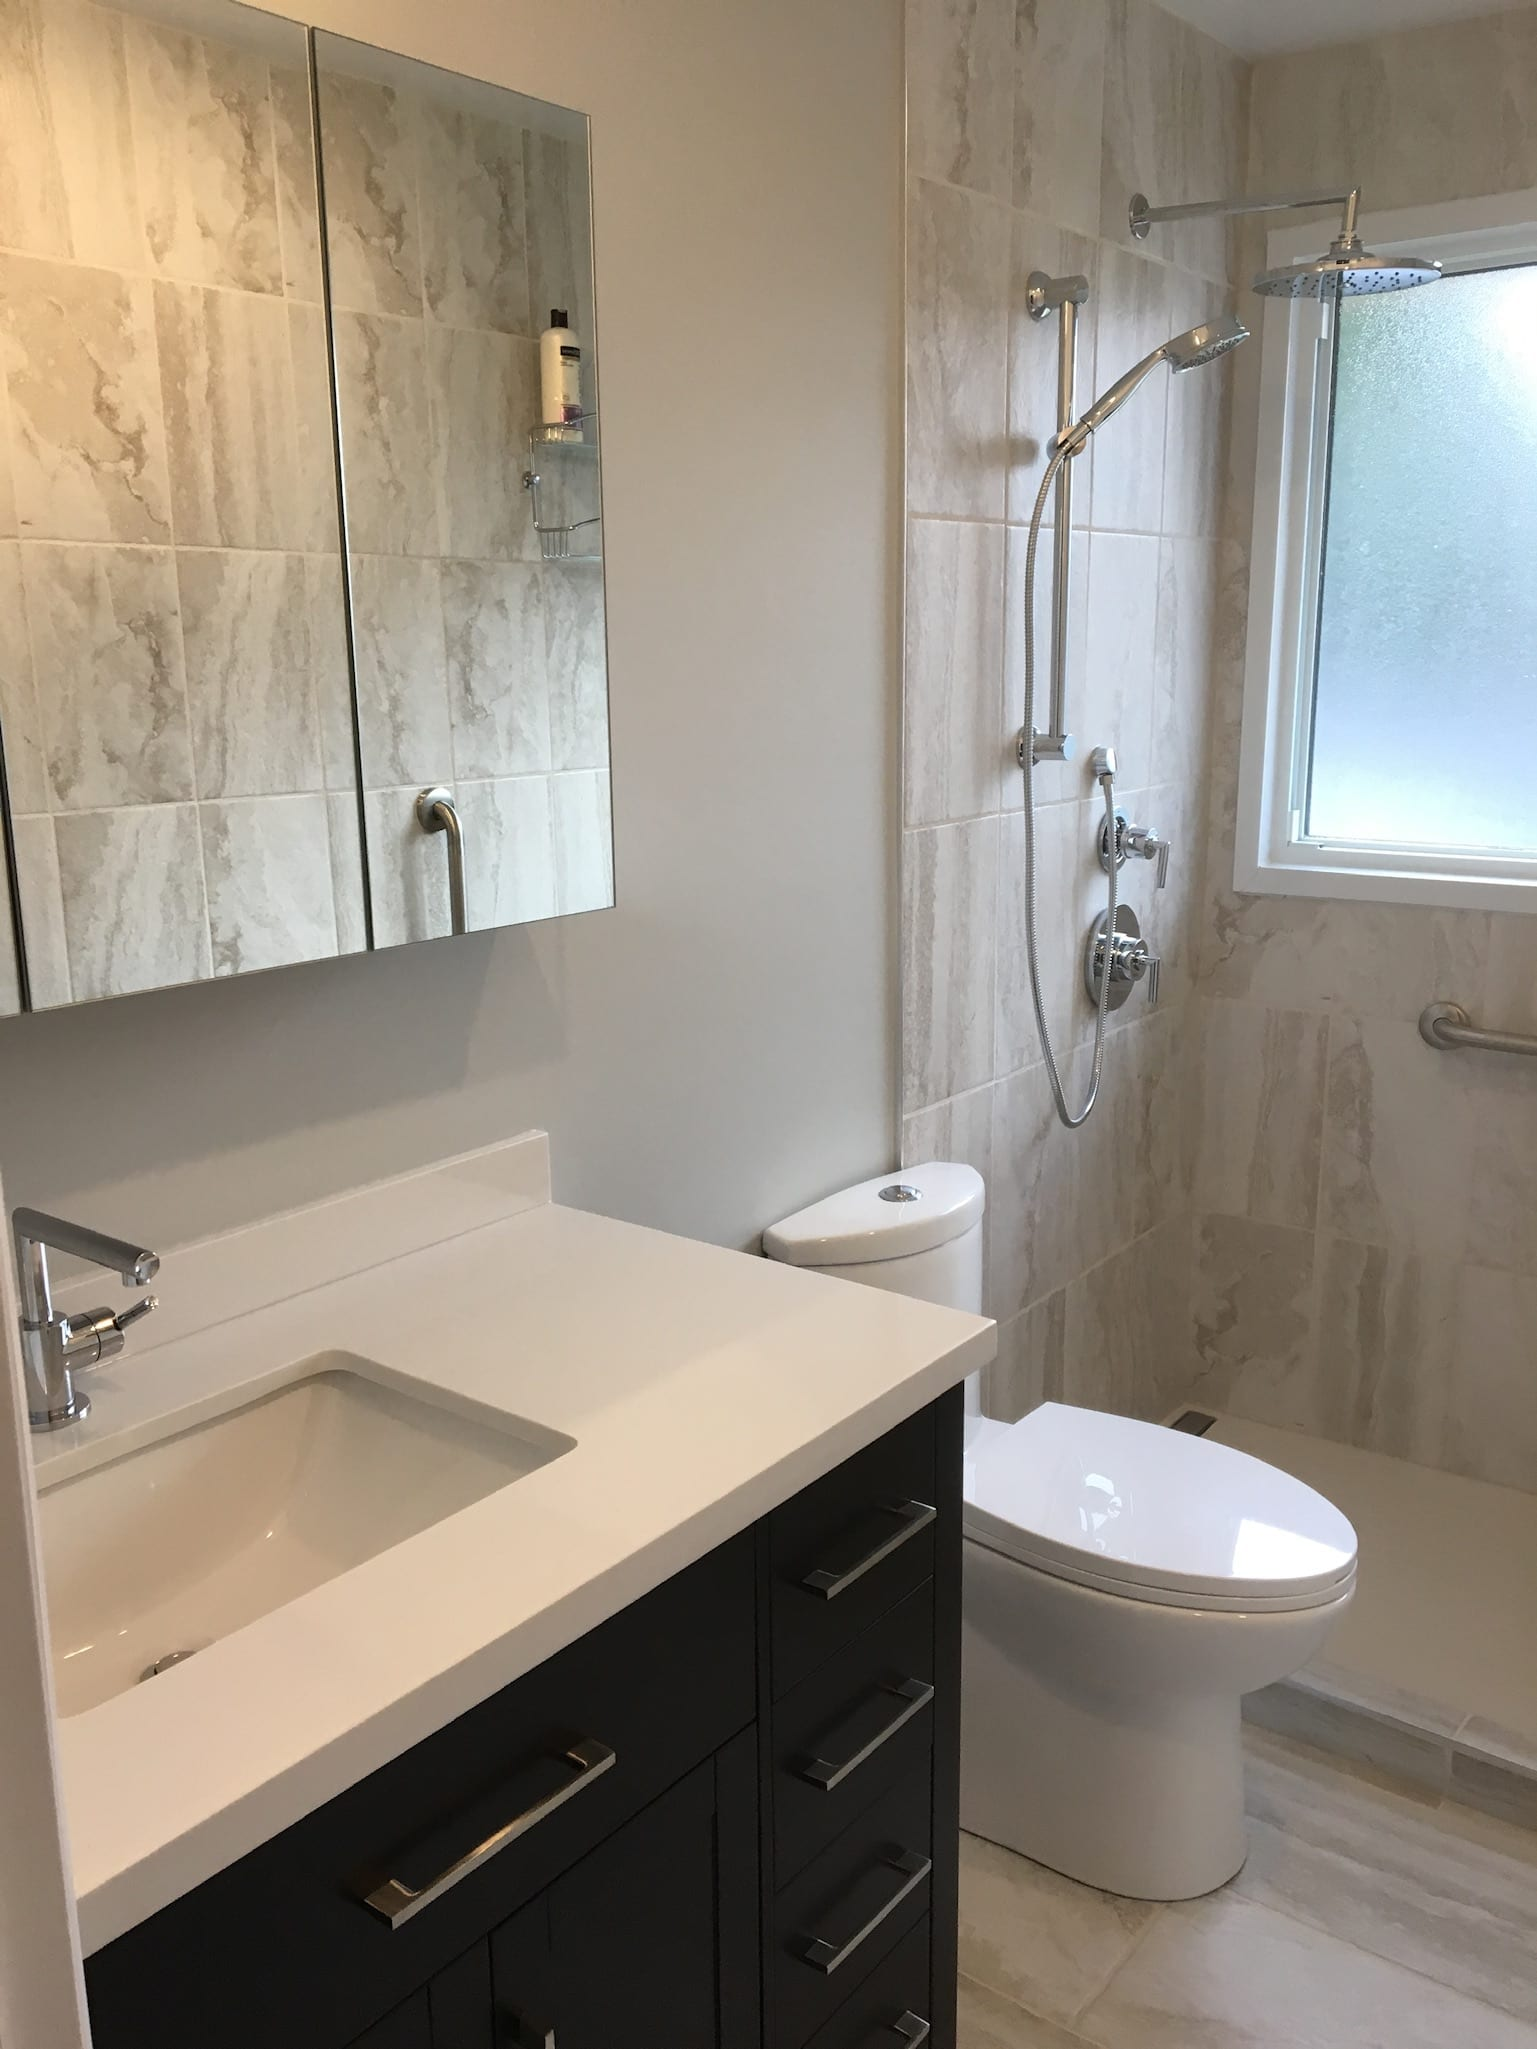 Bathrooms | Capolavoro Renovation Inc